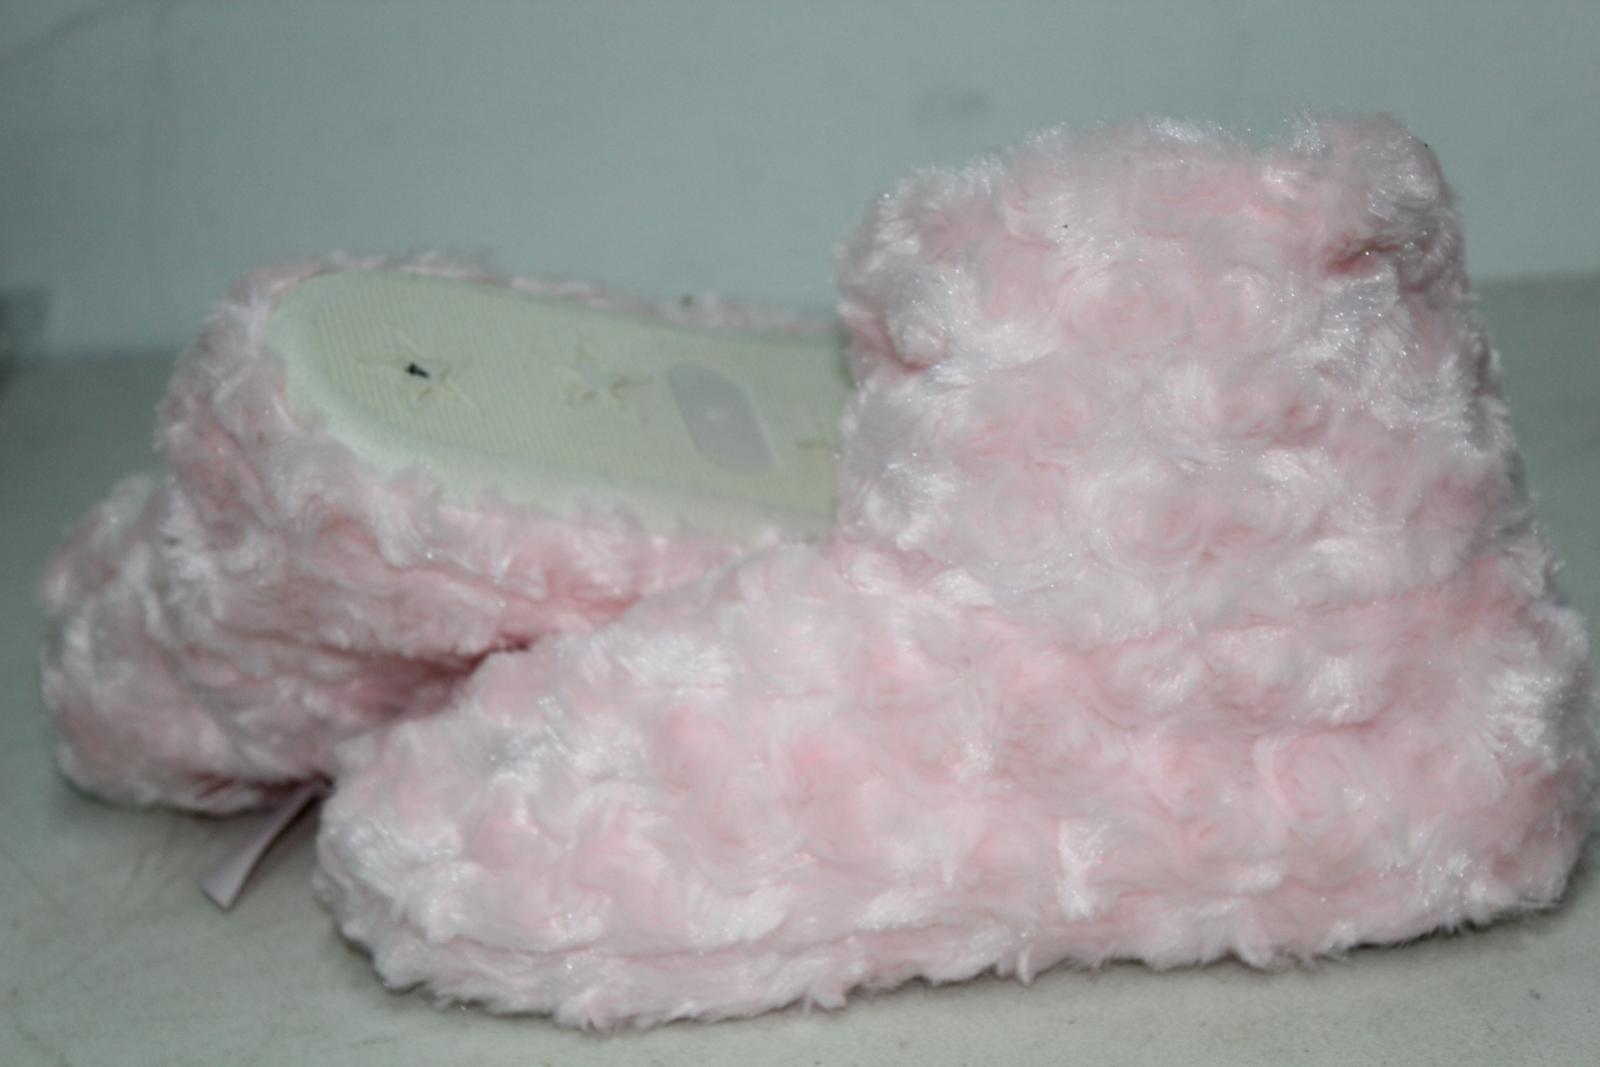 CHIC PRINCESS Girls Pink Fluffy Winter Warm Slipper Shoe Boots UK5 EU38 BNWT 9